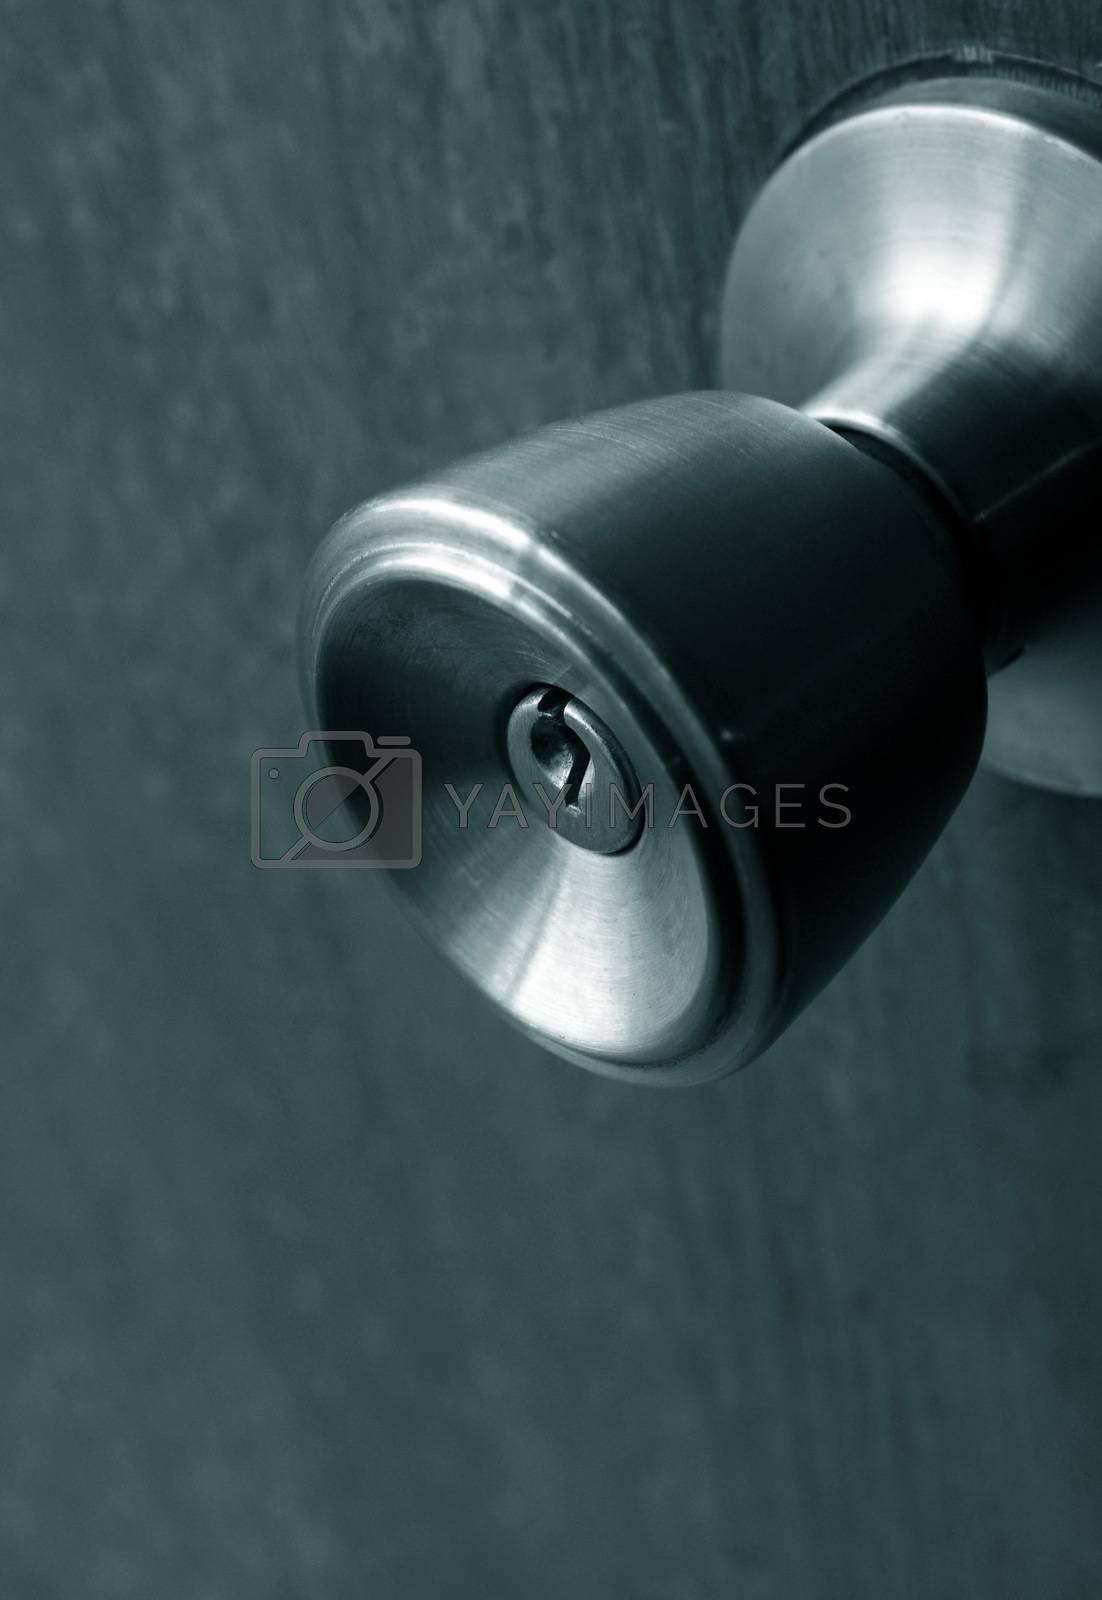 closeup of old rusty door lock.shallow DOF